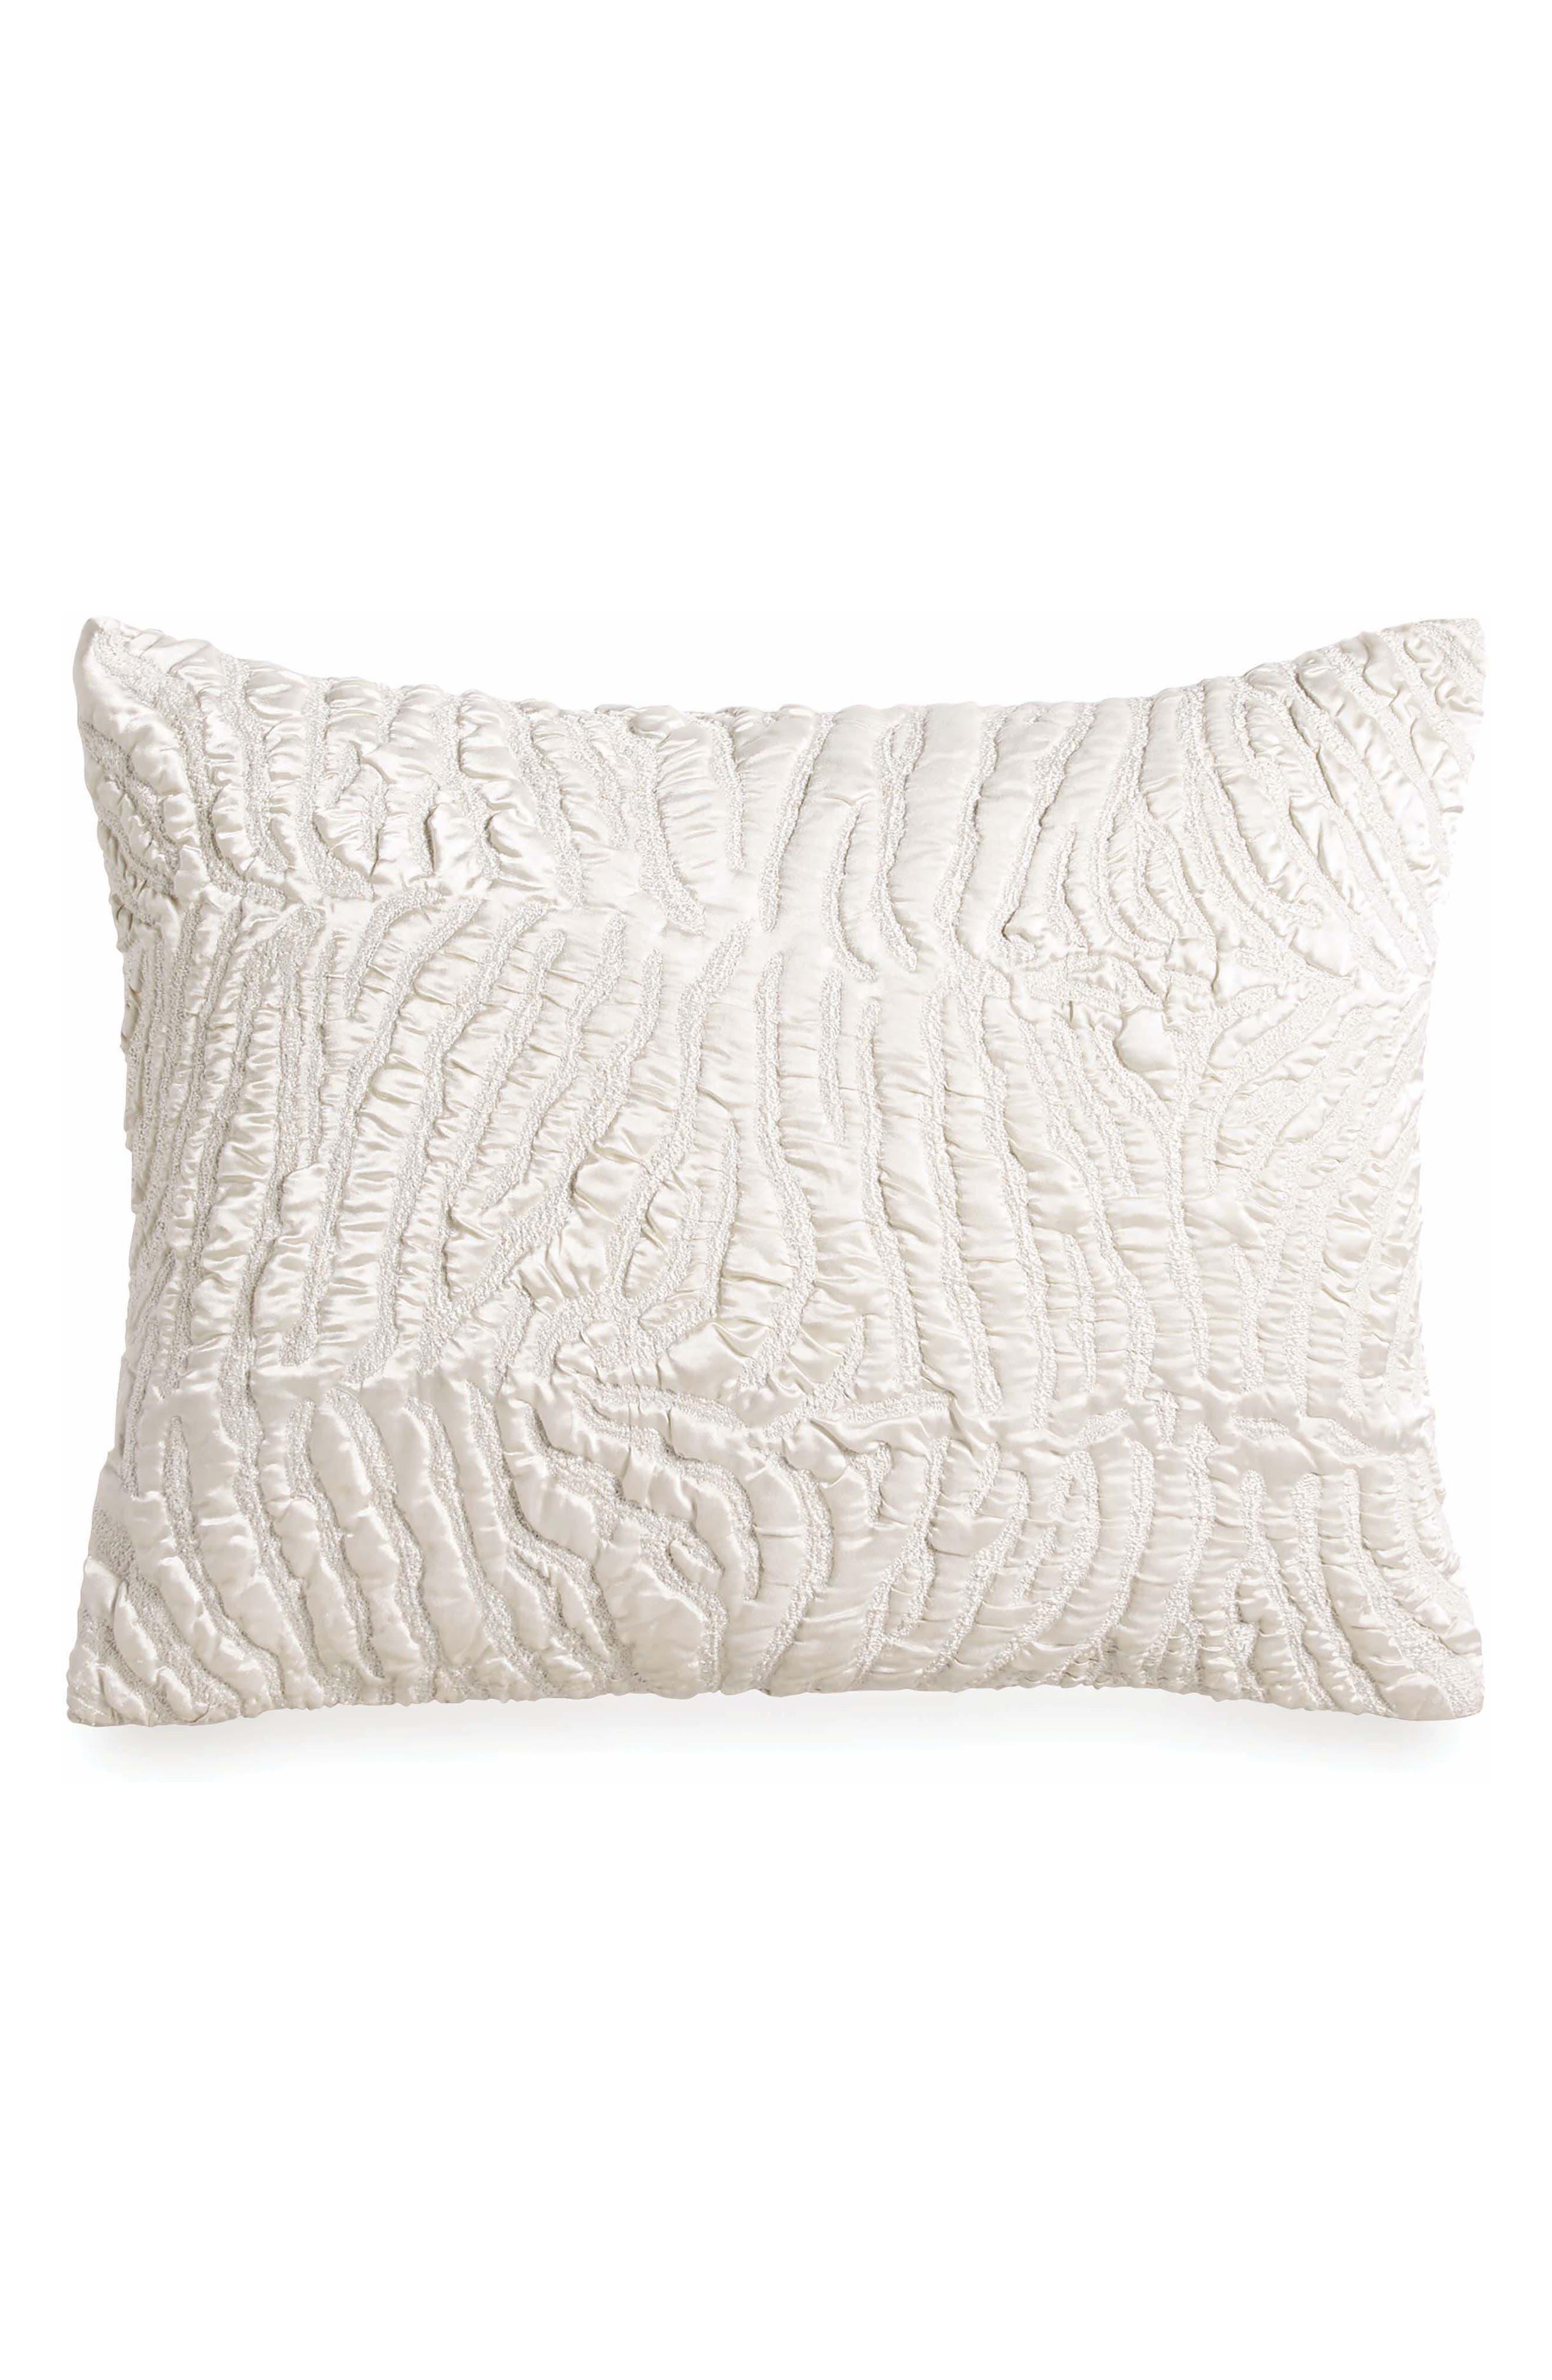 Opal Essence Pillow,                             Main thumbnail 1, color,                             IVORY